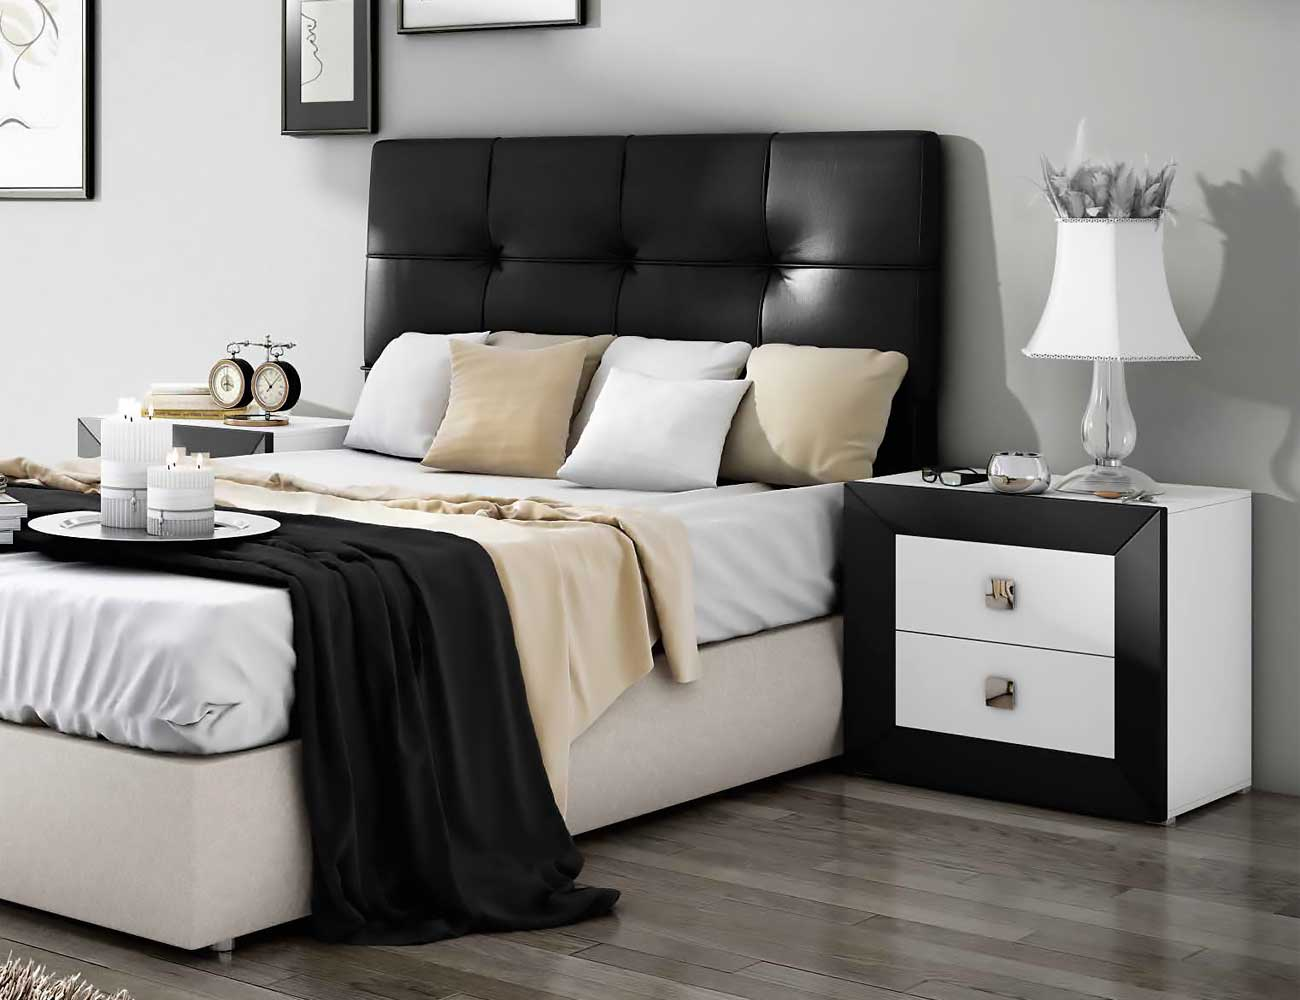 Dormitorio de matrimonio moderno con cabecero en polipiel for Dormitorio matrimonio negro